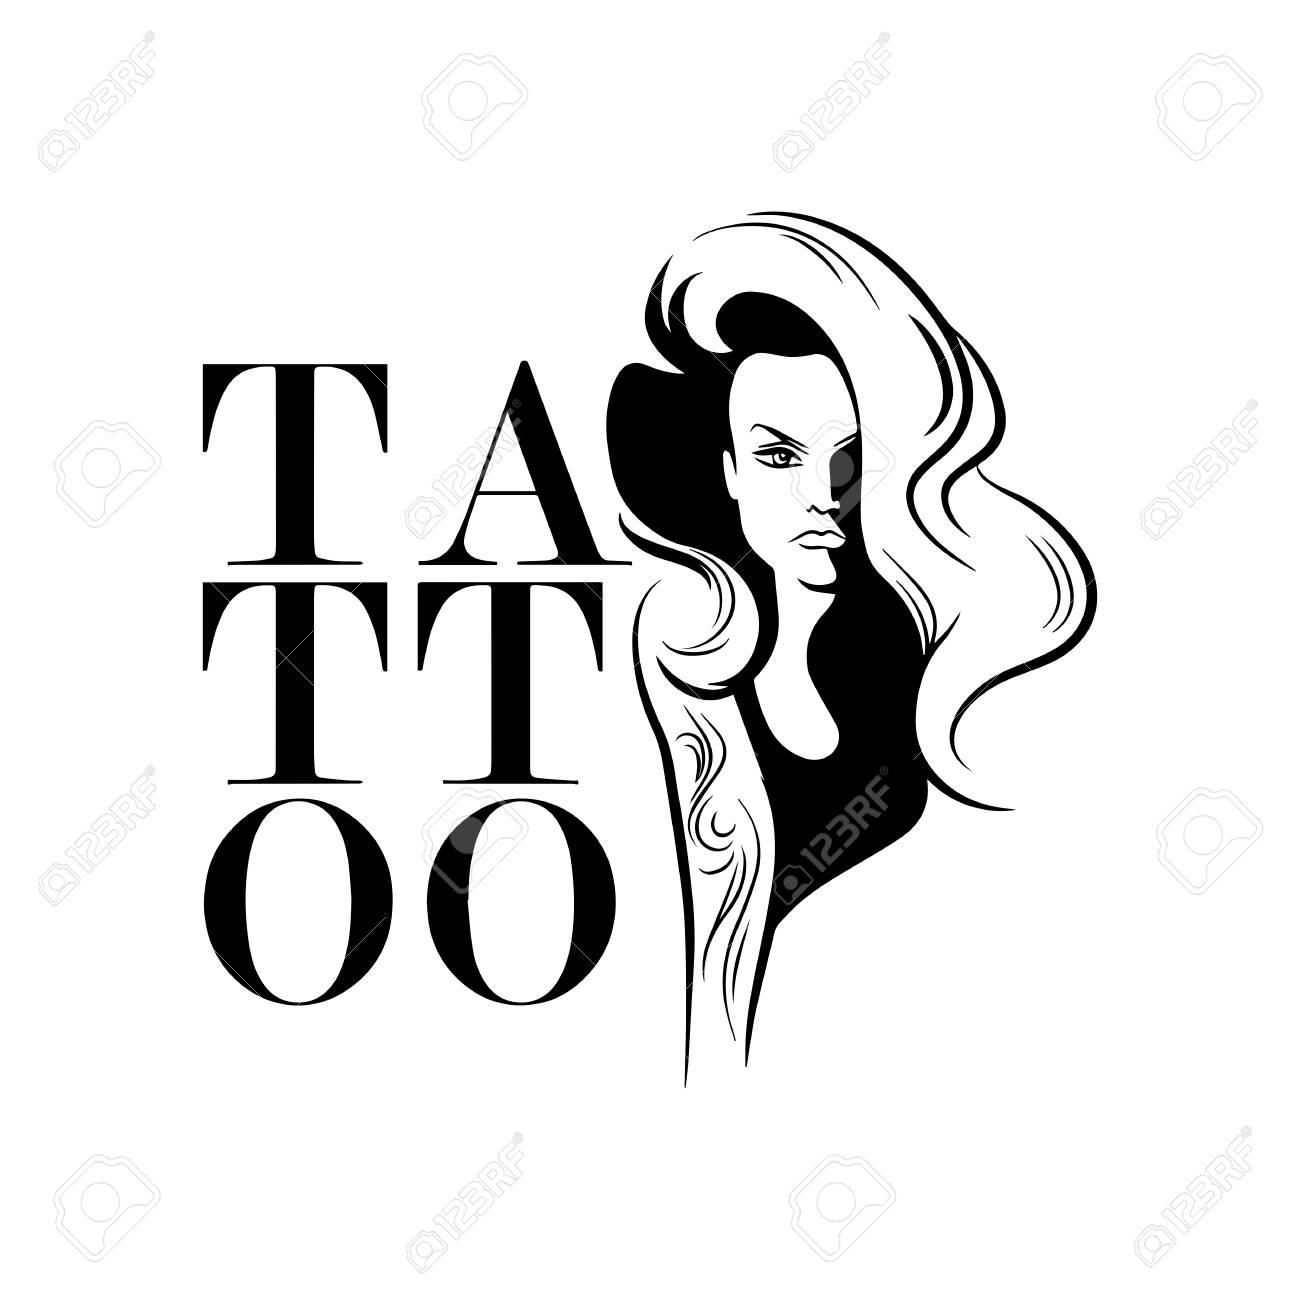 Tattoo Shop Logo Design Royalty Free Cliparts Vectors And Stock